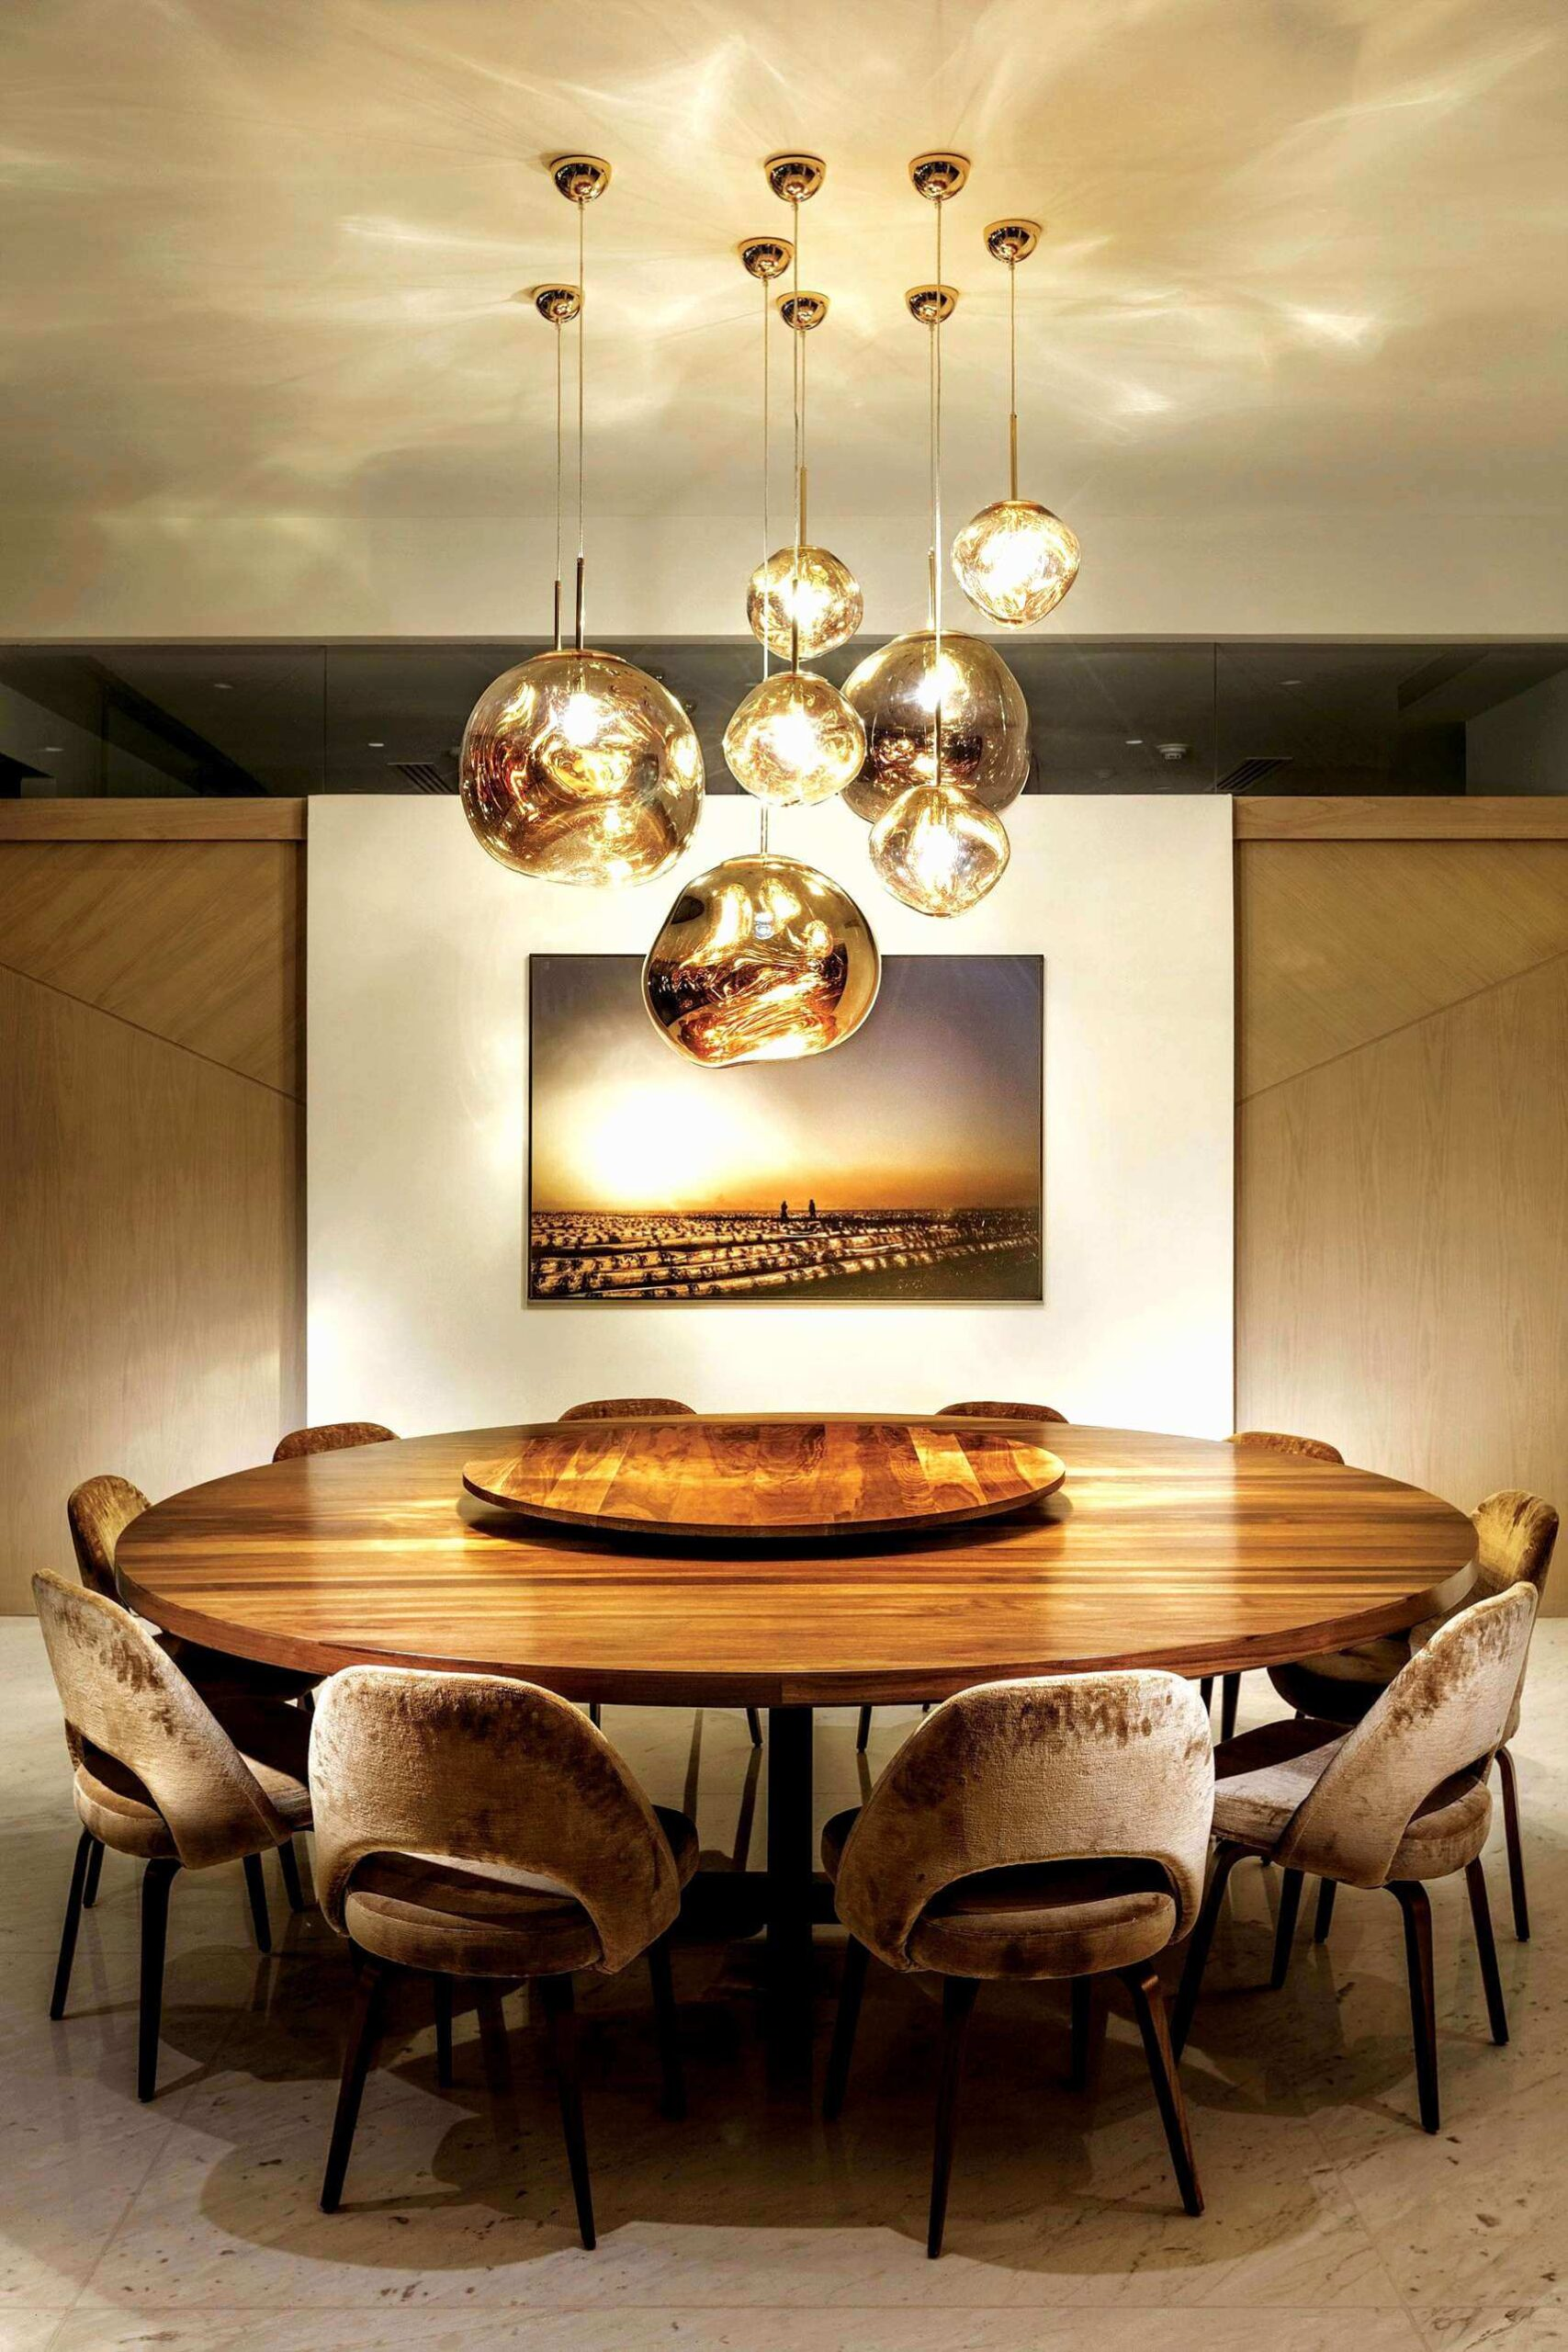 Full Size of 59 Genial Led Lampen Wohnzimmer Luxus Tolles Ideen Vinylboden Büffelleder Sofa Anbauwand Hängeleuchte Sessel Bad Moderne Deckenleuchte Deckenlampe Wohnzimmer Wohnzimmer Led Lampe